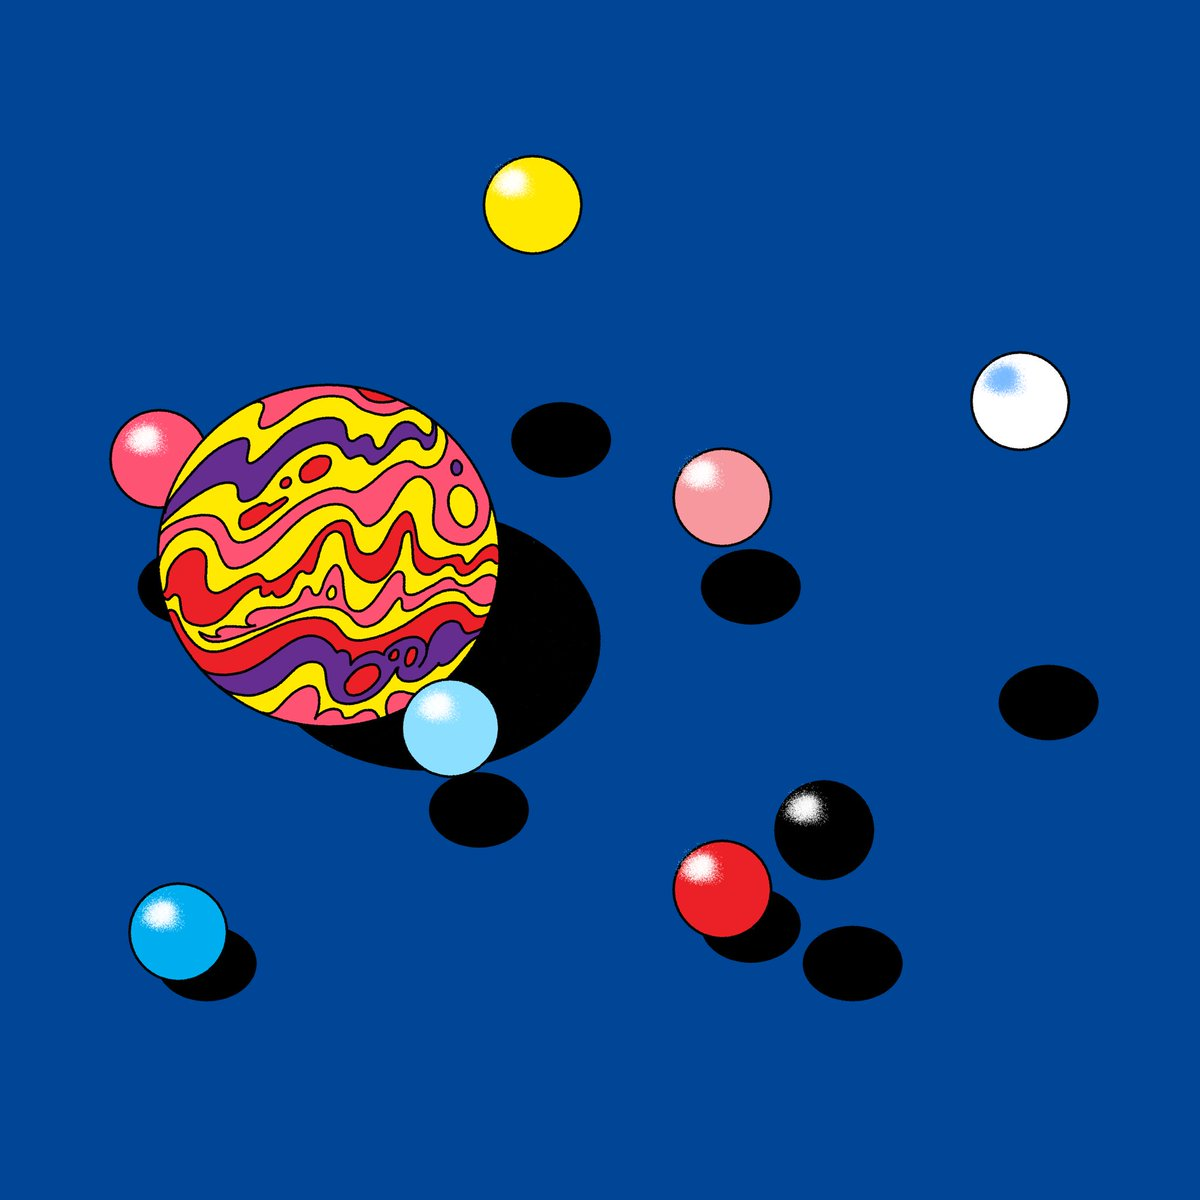 [#STATION] #EXO #Power #Remixes  By #R3HAB(@R3HAB), #Dash_Berlin(@dashberlin), #SHAUN and #IMLAY